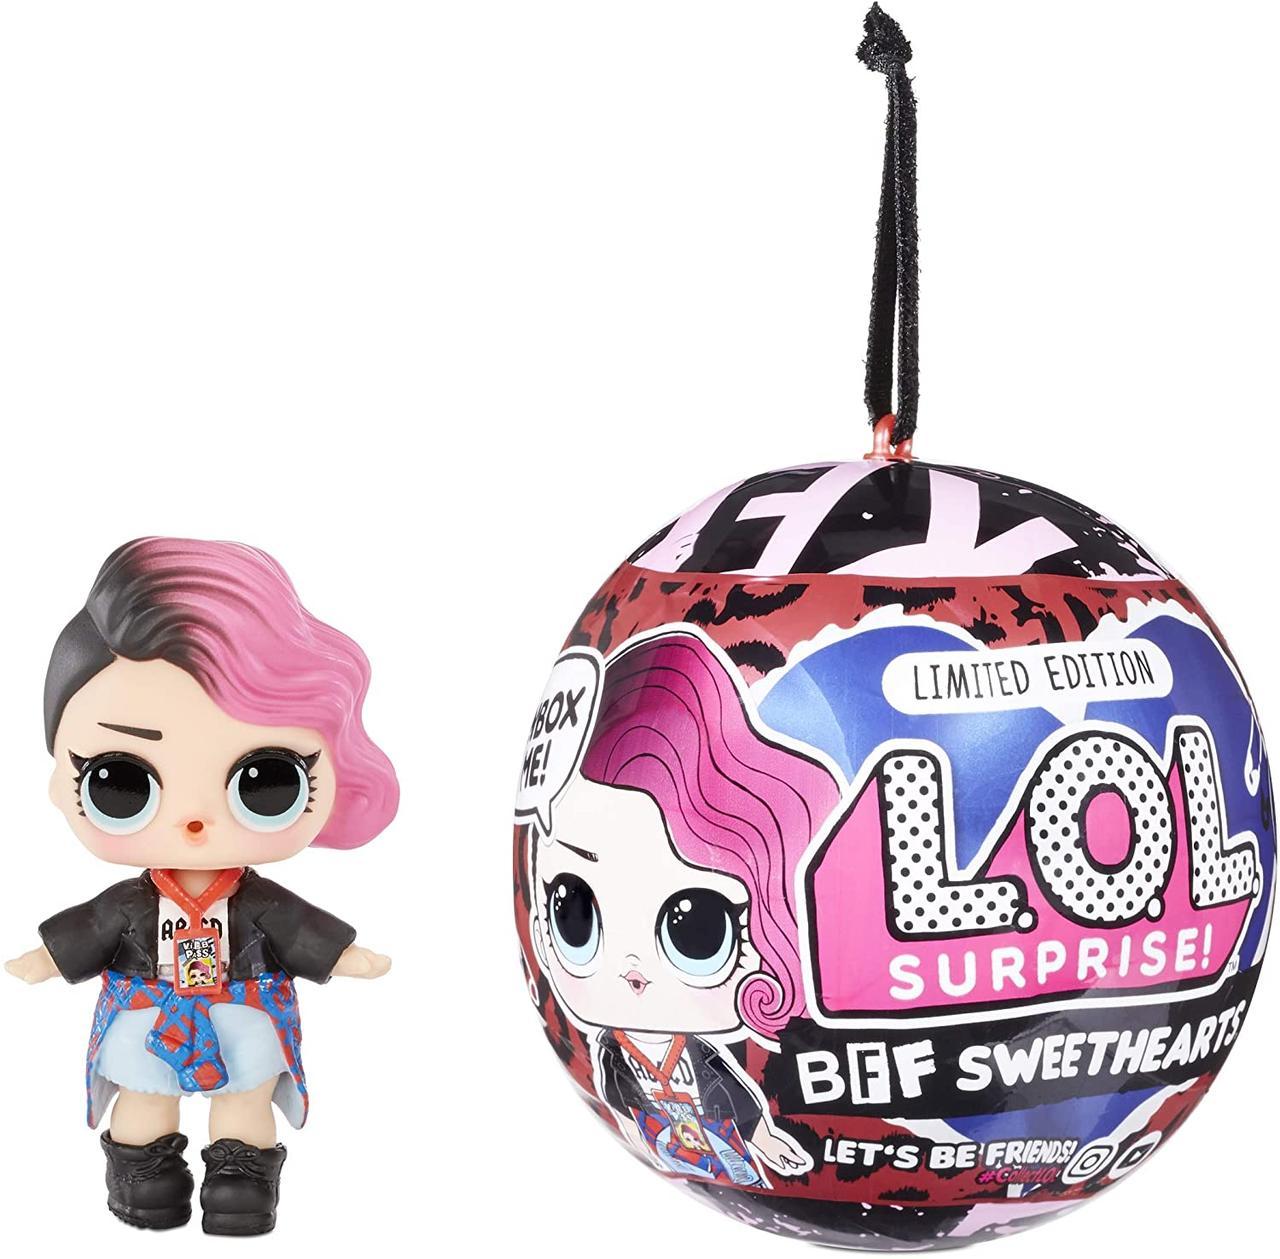 LOL Surprise Кукла ЛОЛ Девочка Рокер в шарике, BFF Sweethearts Rocker Supreme Оригинал